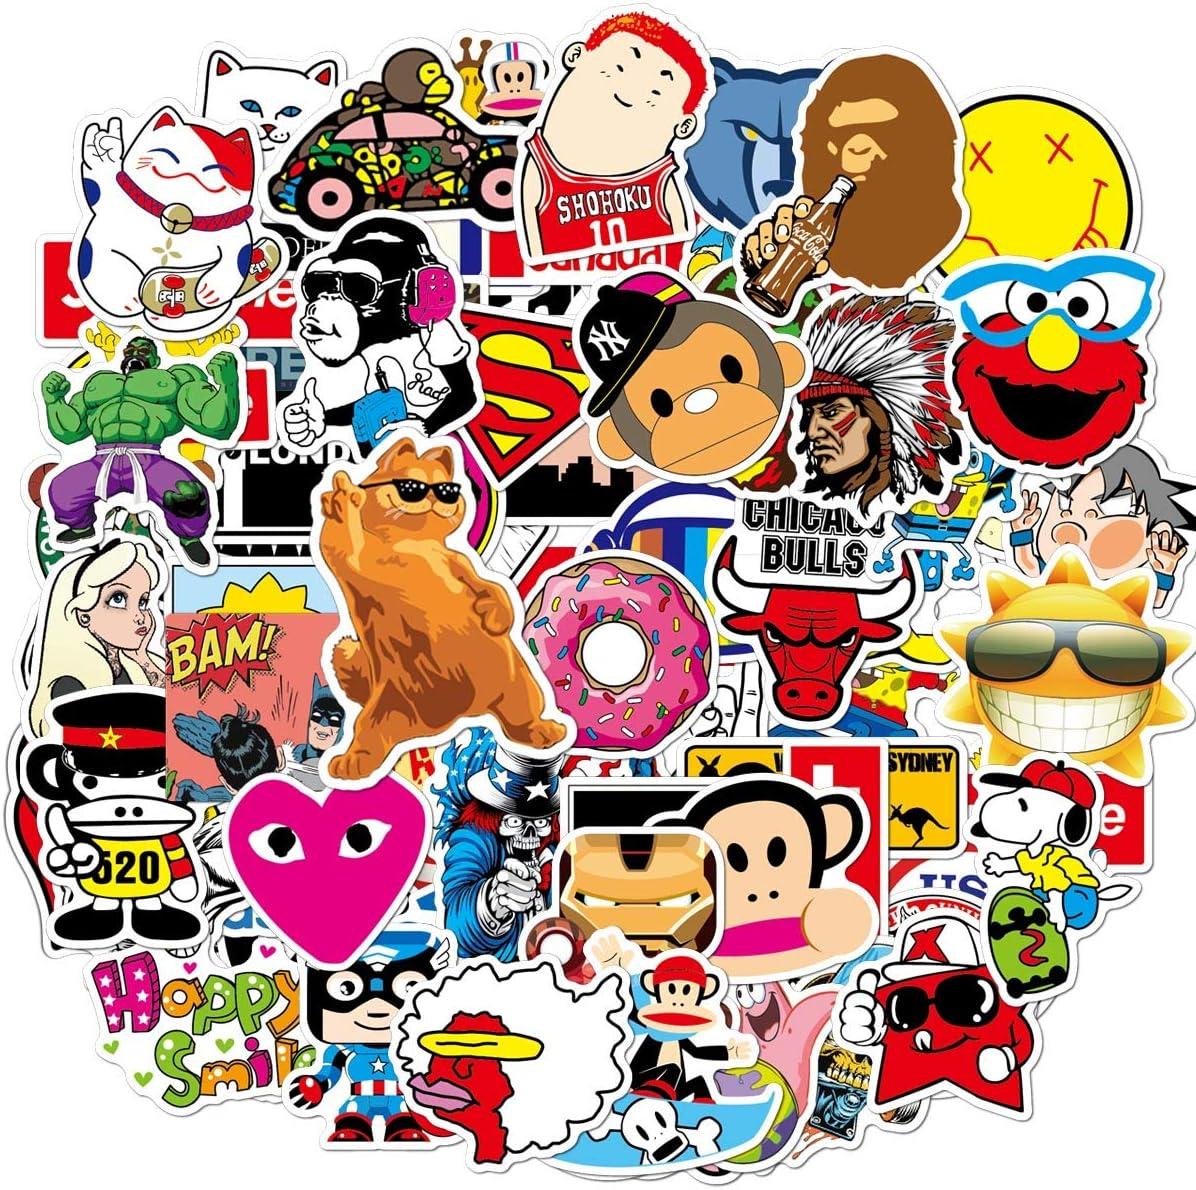 Cute Vsco Vinyl Stickers for Kids Hydroflasks Water Bottles 100 Pcs Aesthetic Trendy Kawaii Stickers Vinyl Wall Decals for Laptop Helmet Car Bumper Luggage Skateboard for Teens Boys Girls Kids